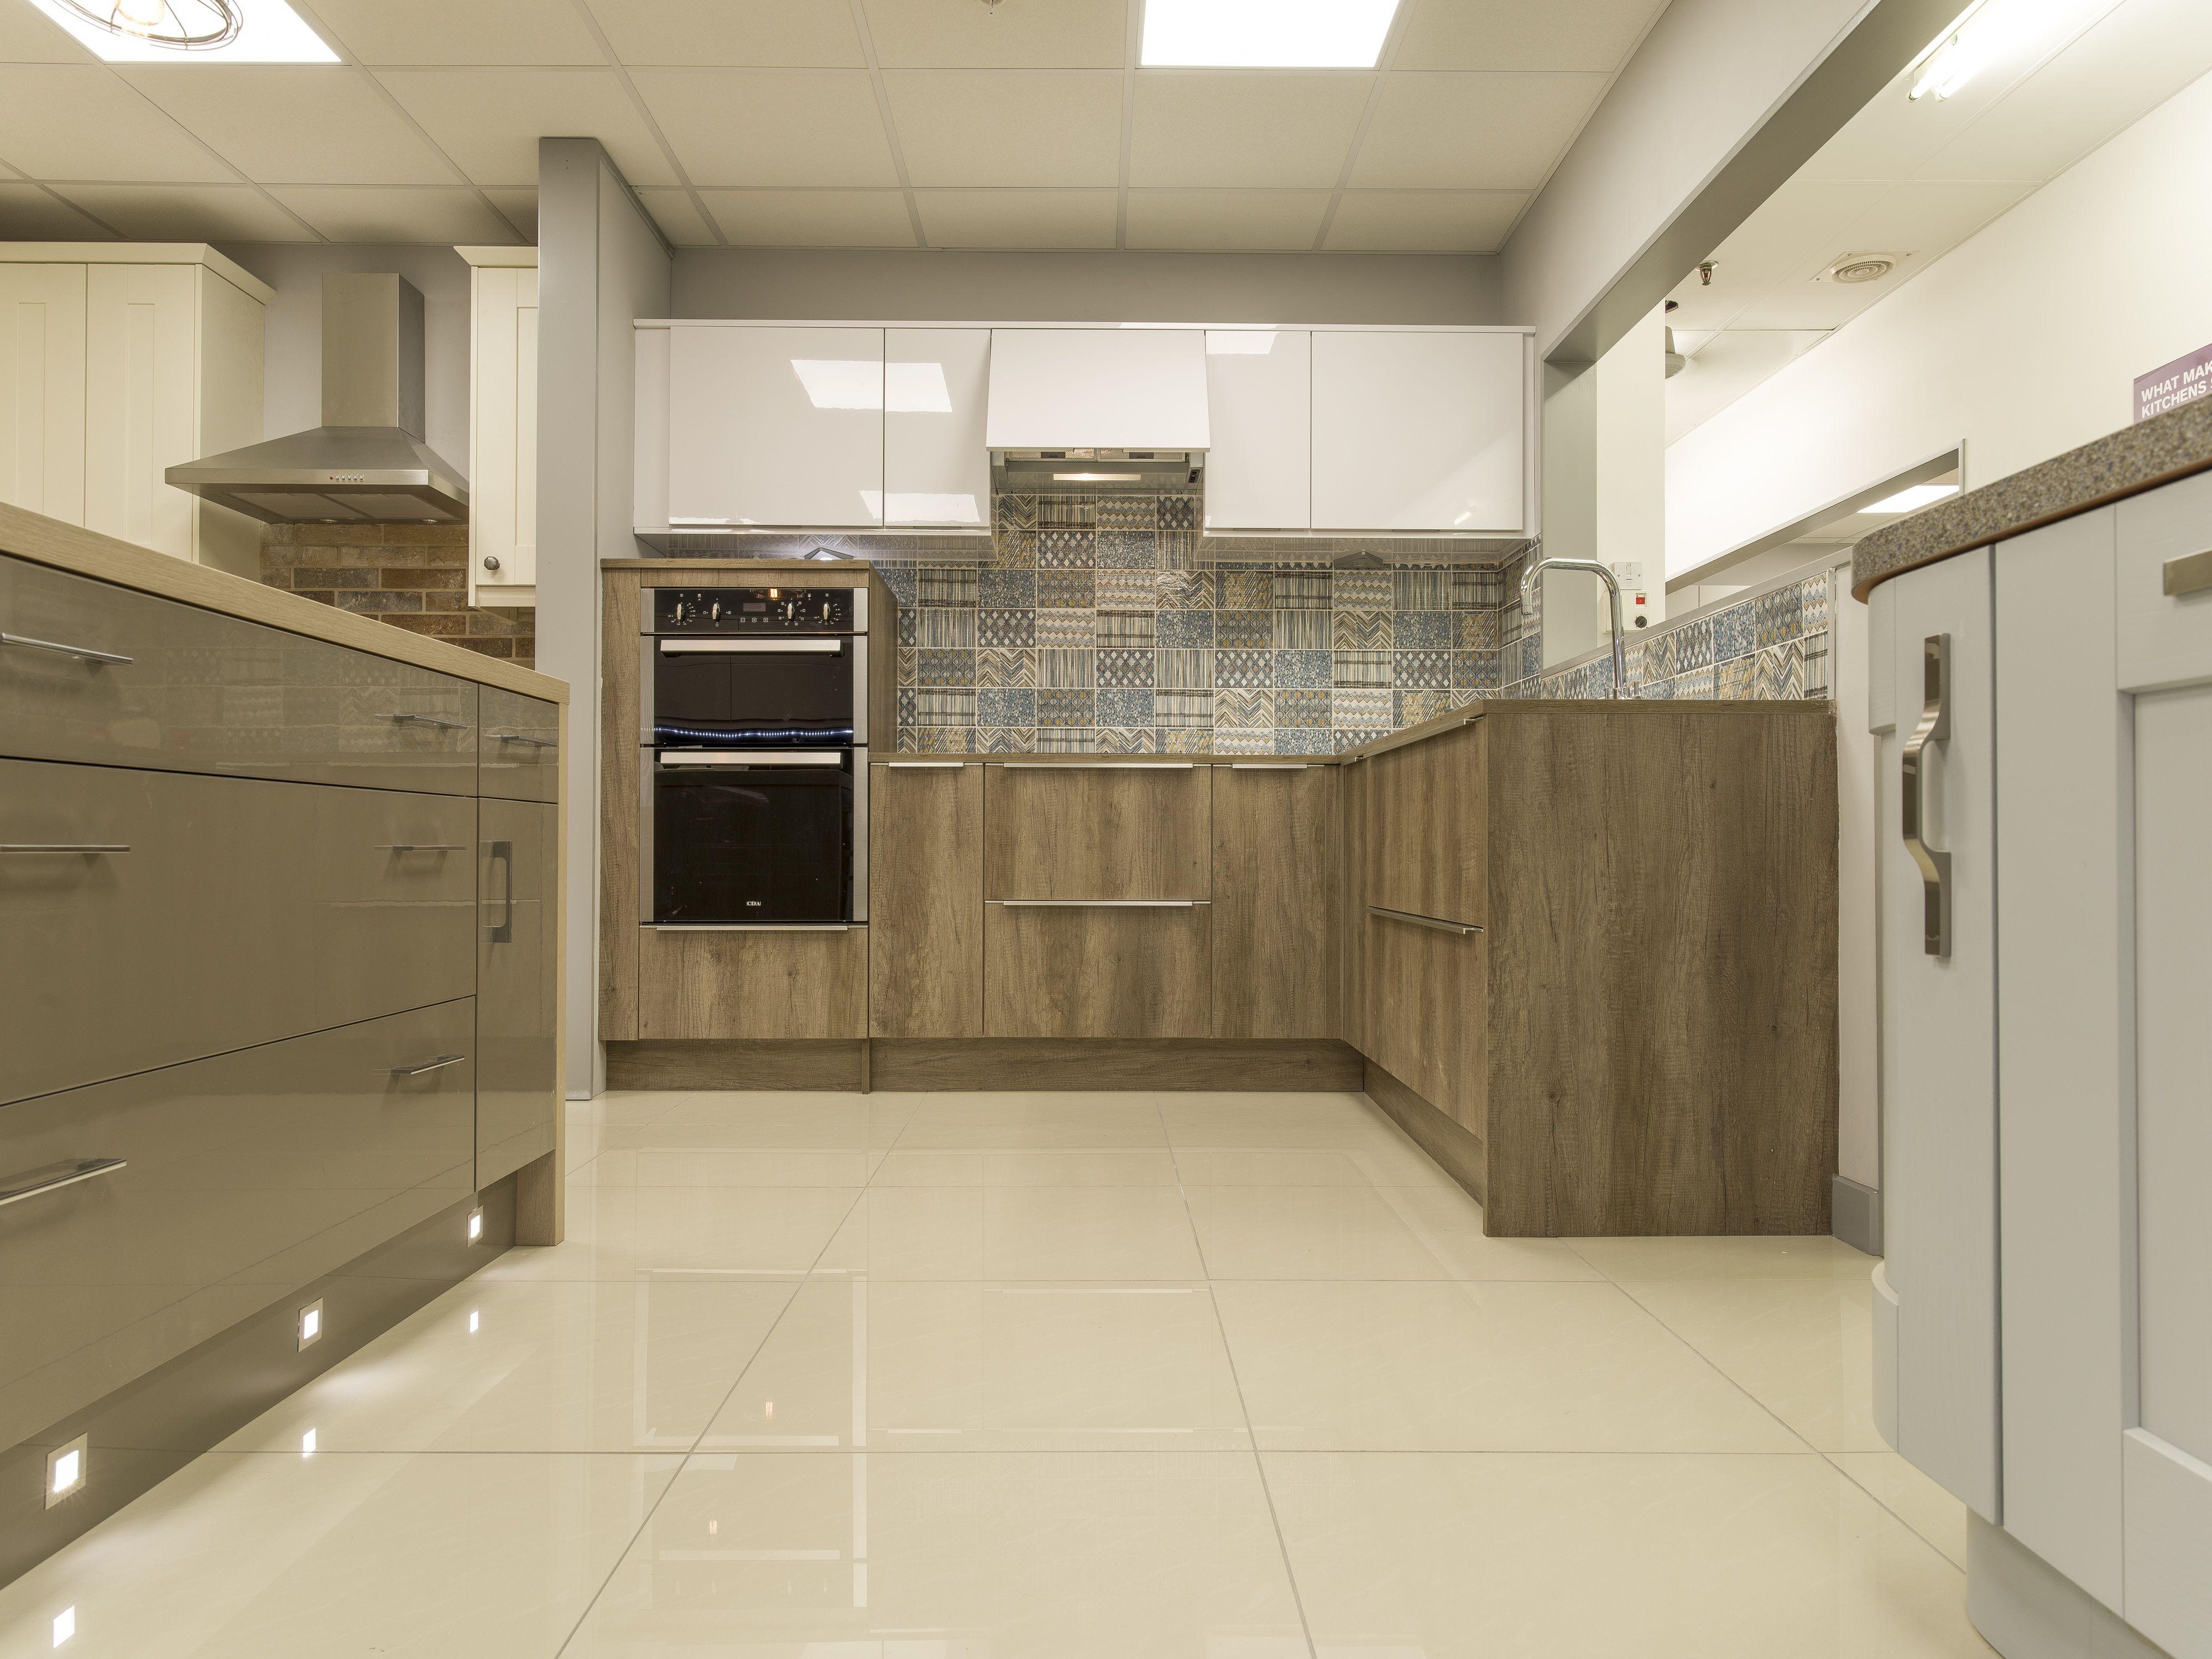 Buildbase Kitchen Showrooms Kitchen, Kitchen showroom